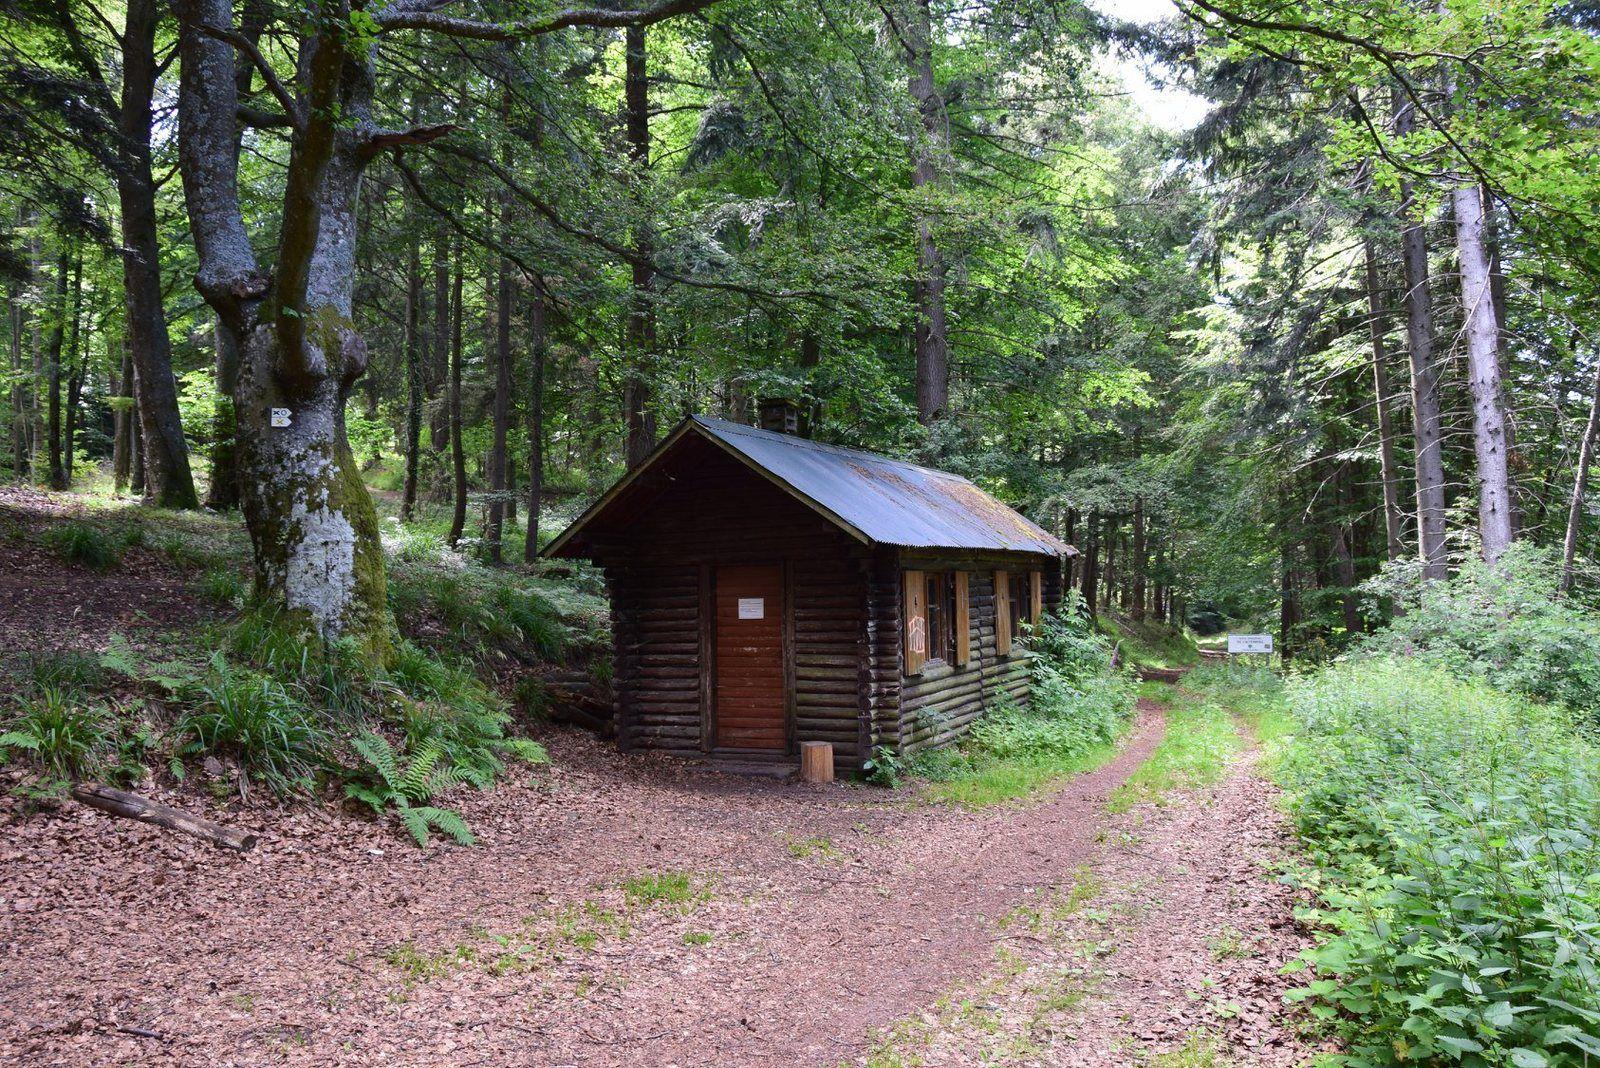 L'abri au col du Schlossberg